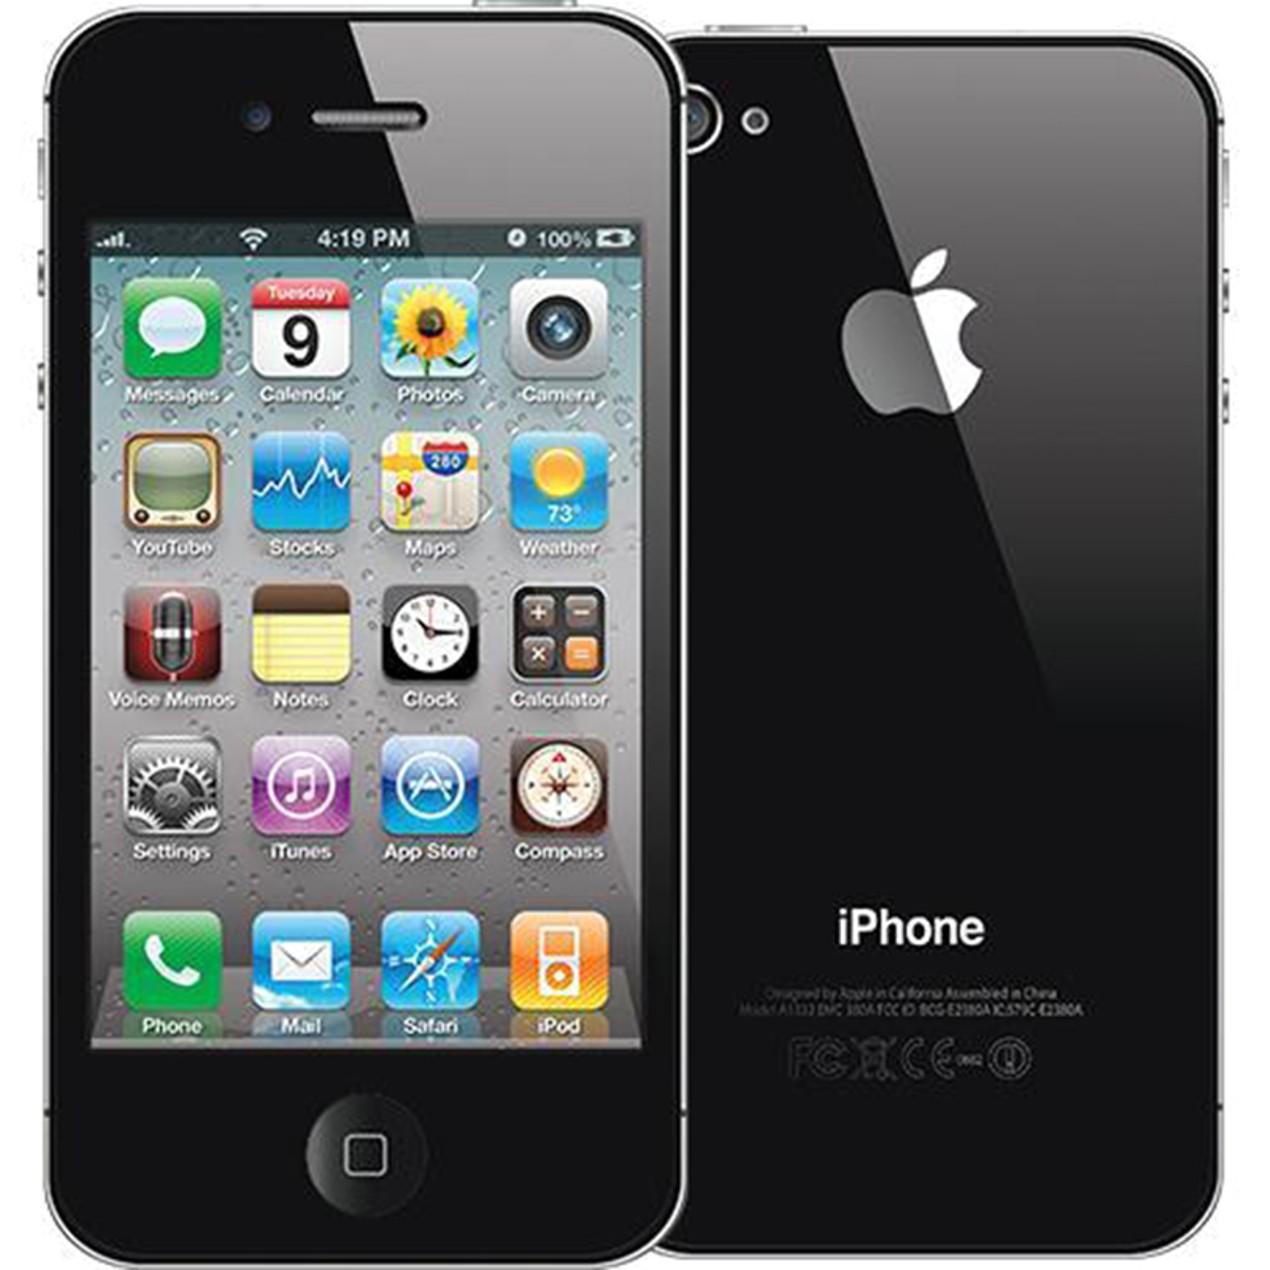 Apple Iphone 4s 8gb Unlocked Black Or White Tanga 4